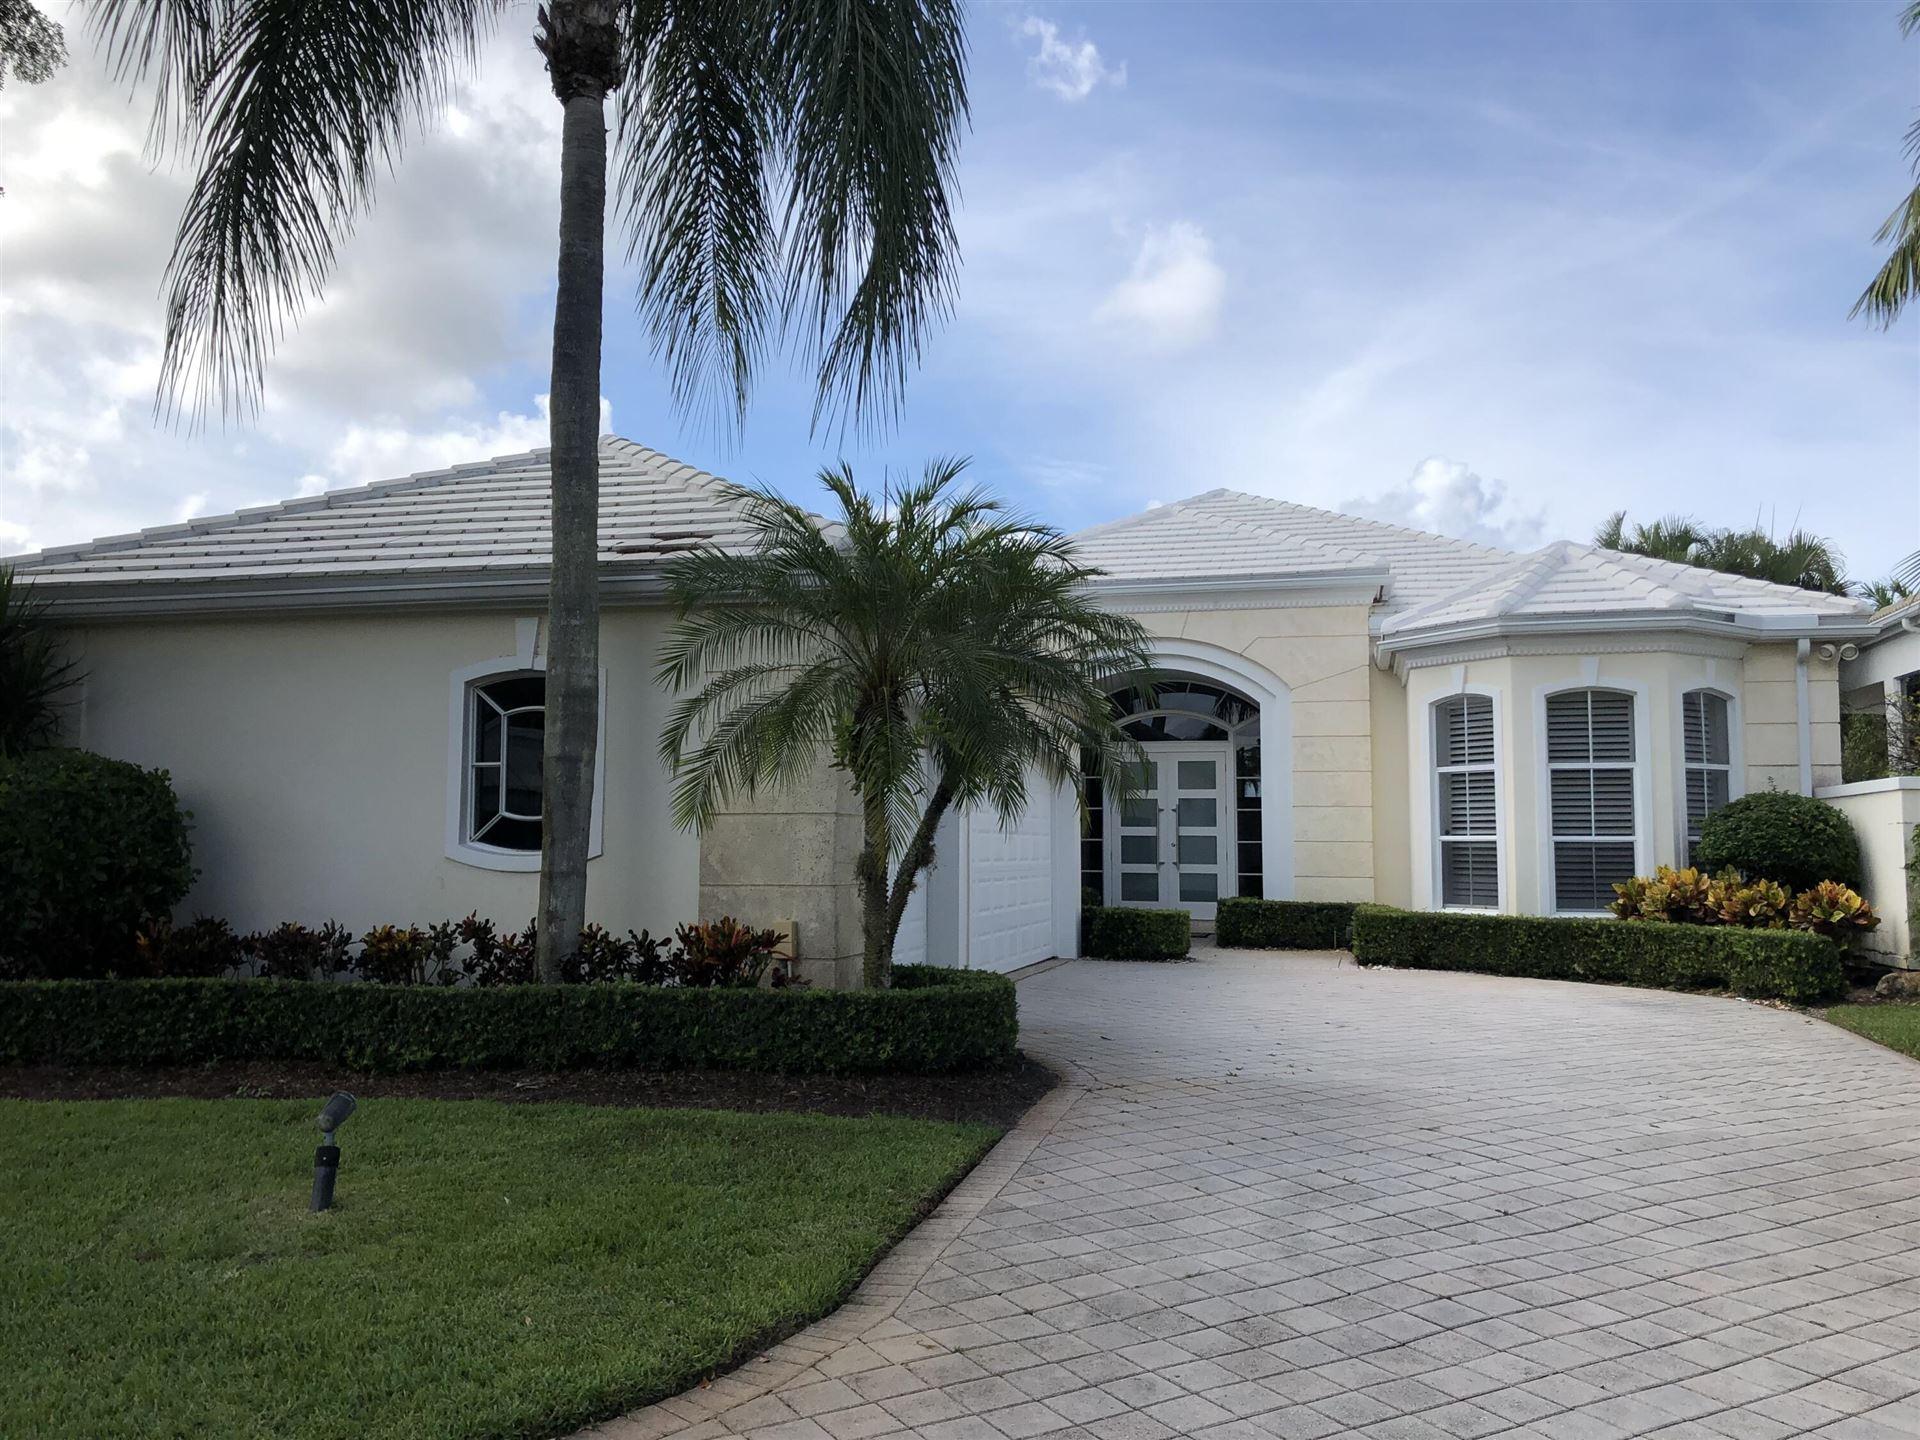 Photo of 1149 Crystal Drive, Palm Beach Gardens, FL 33418 (MLS # RX-10745479)